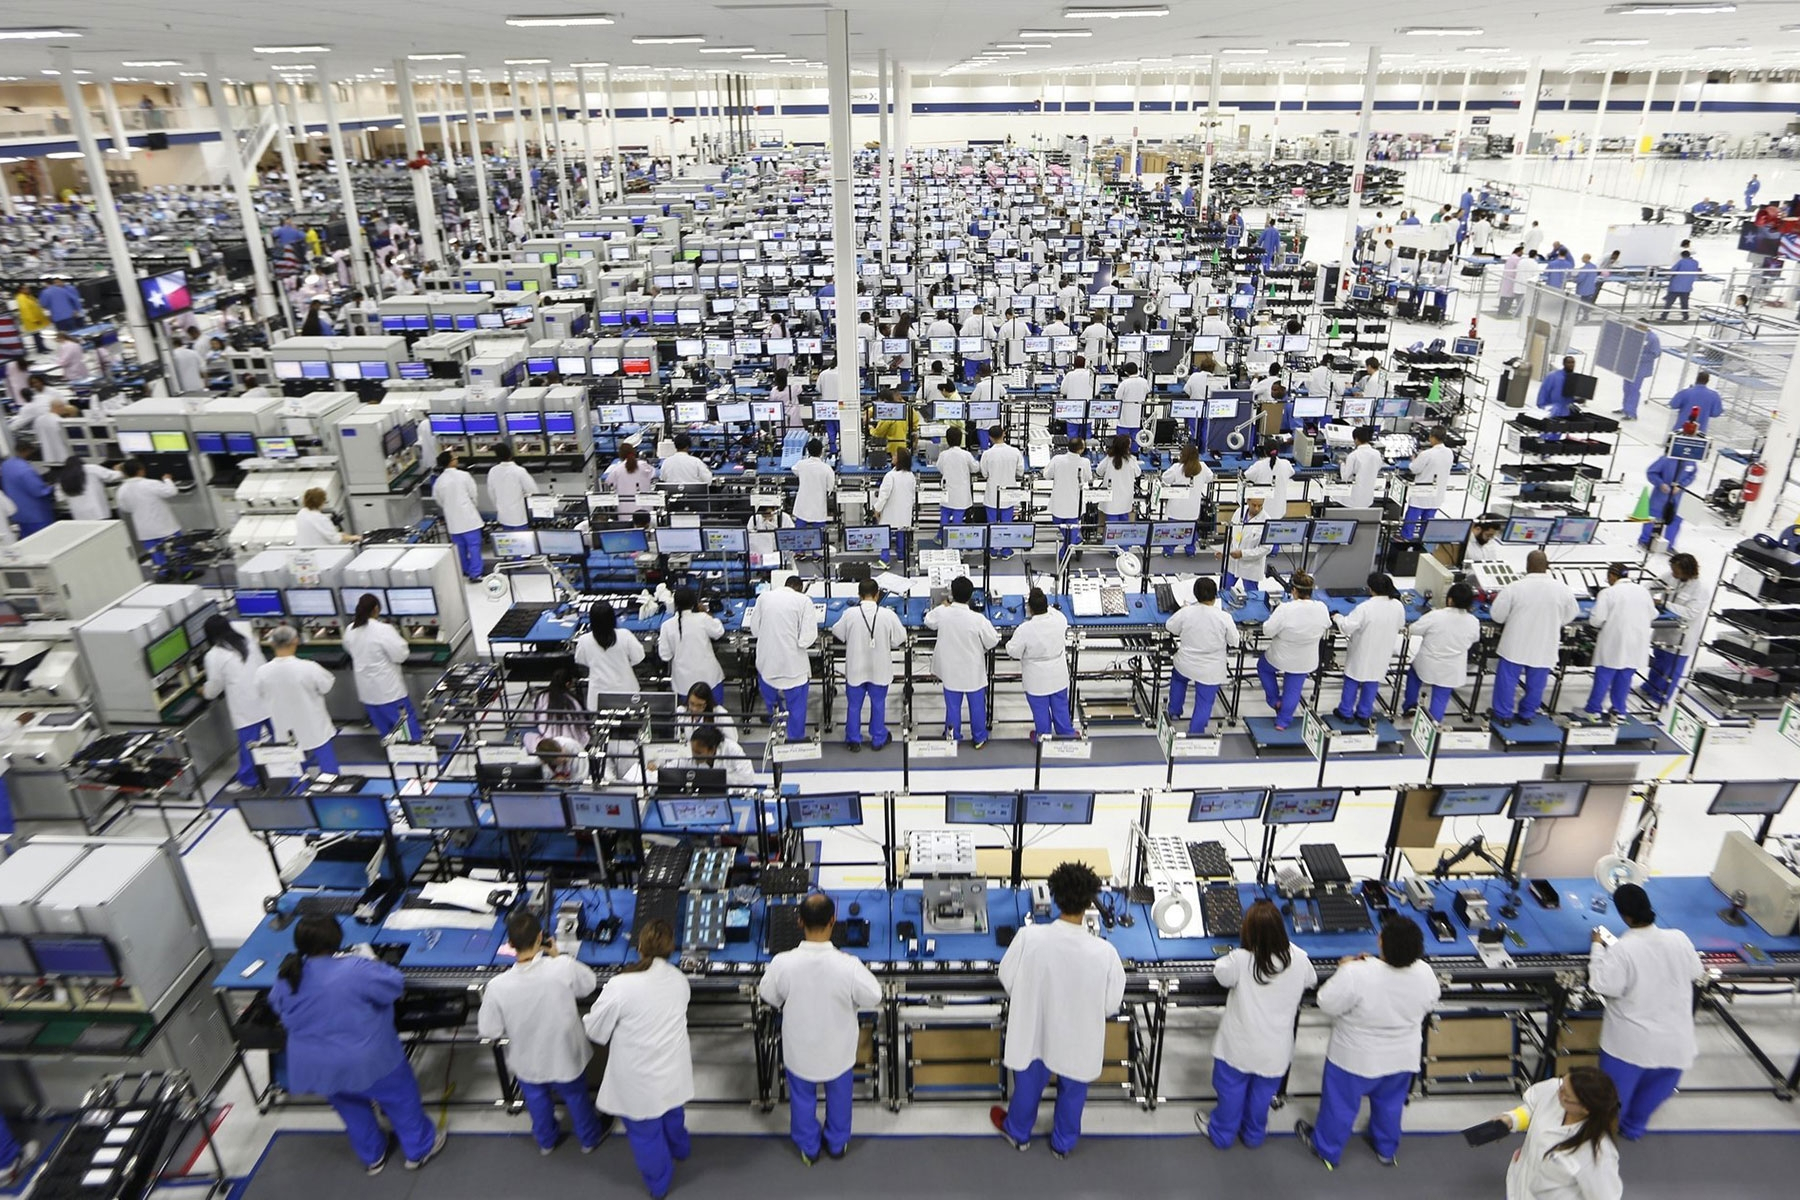 Digitimes Research: продажи смартфонов в Китае в I квартале рухнули вдвое